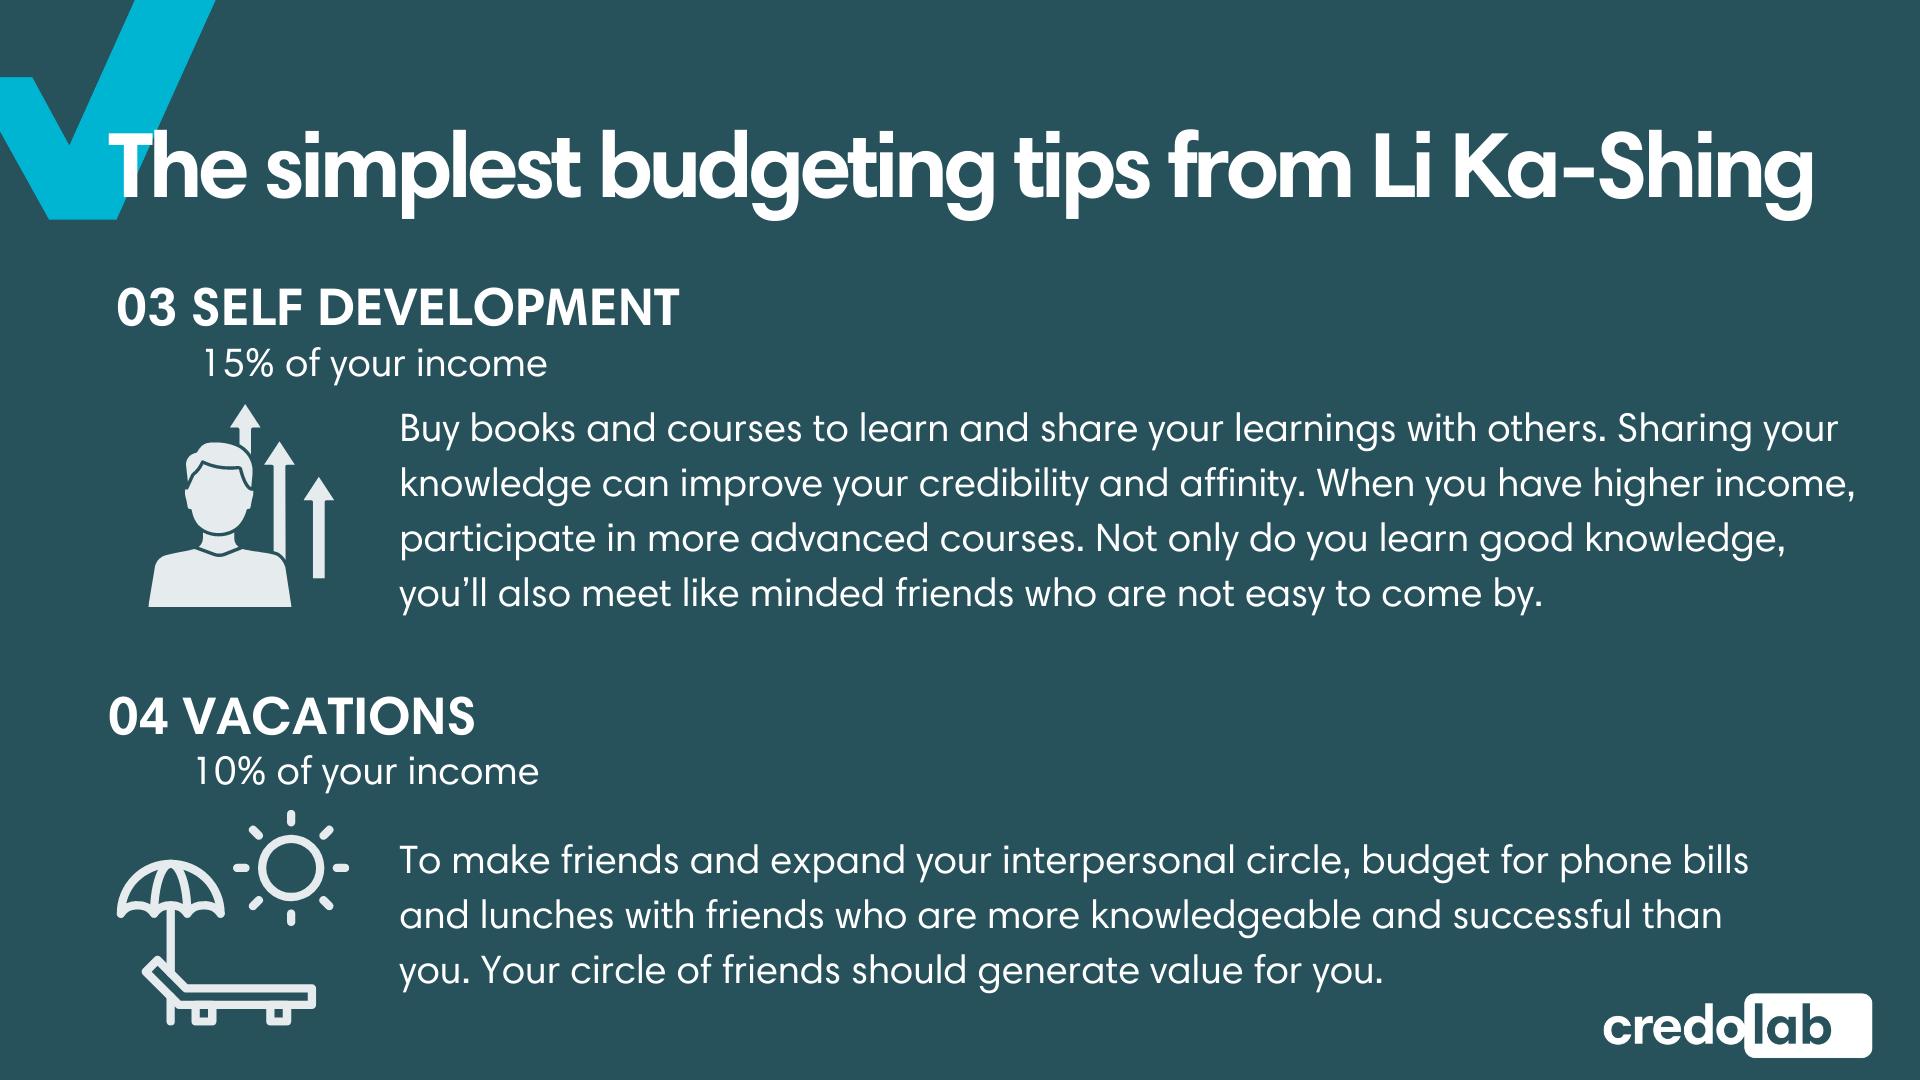 Credolab - Infographic: The simplest budgeting tips from Li Ka-Shing